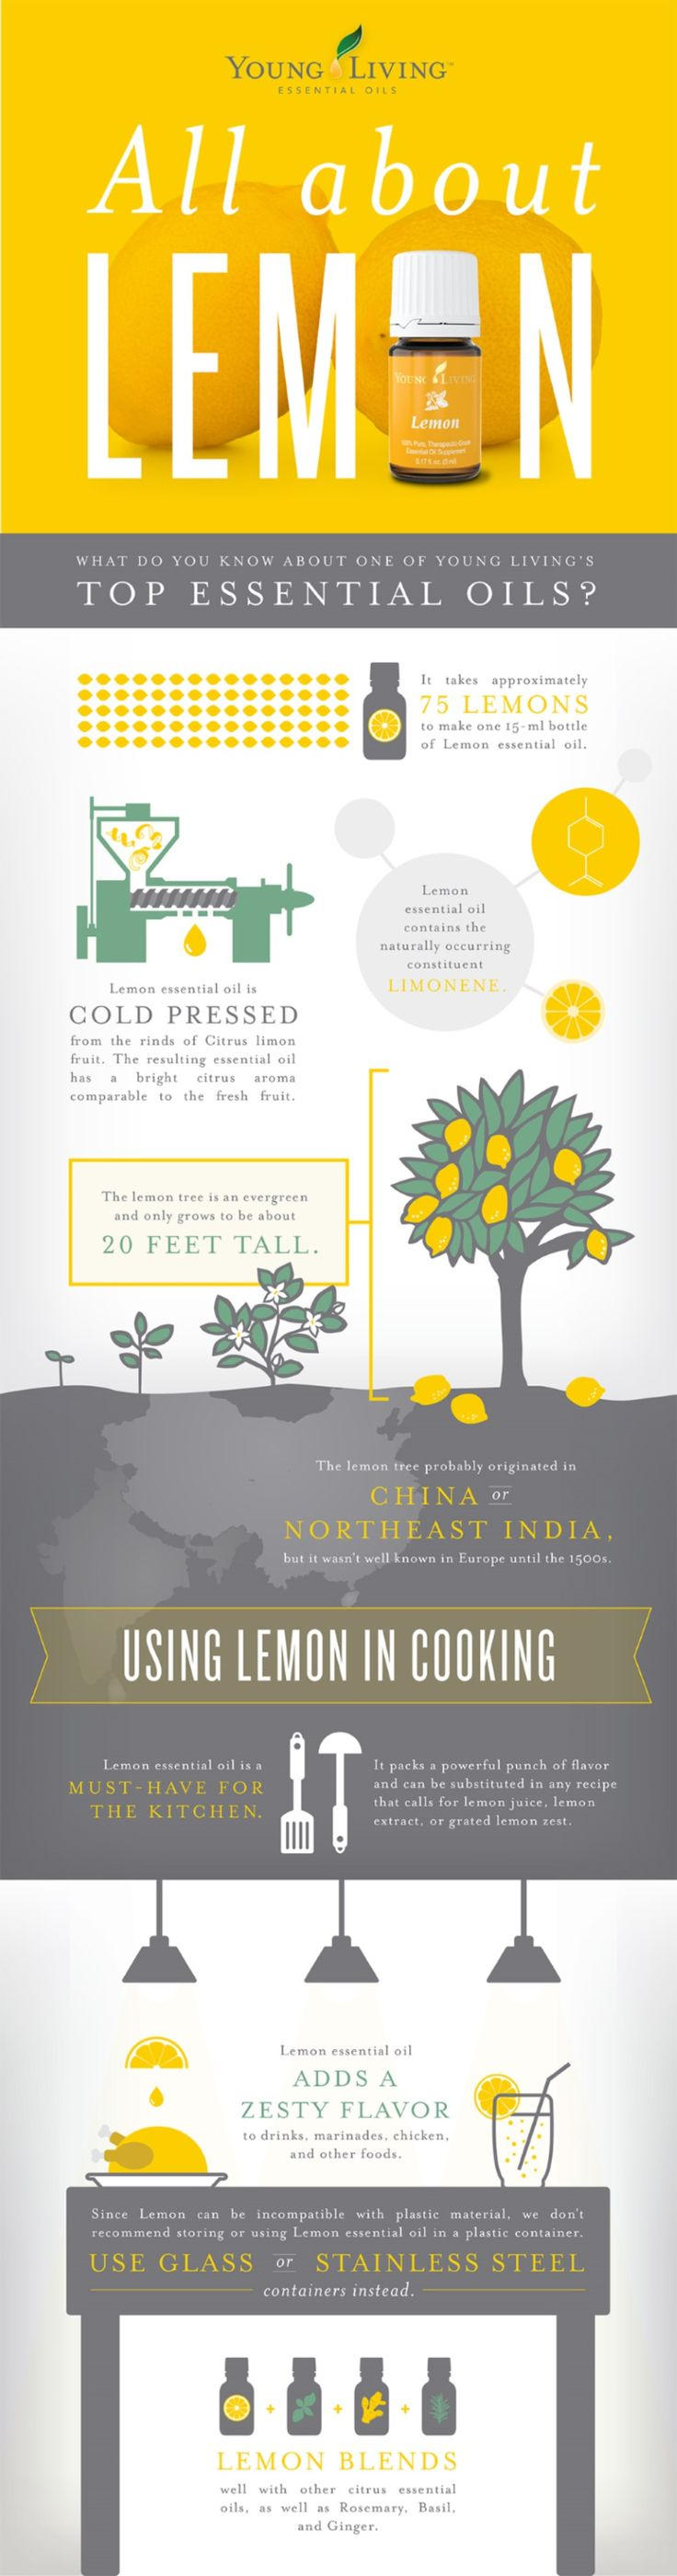 Lemons Infographic - Young Living